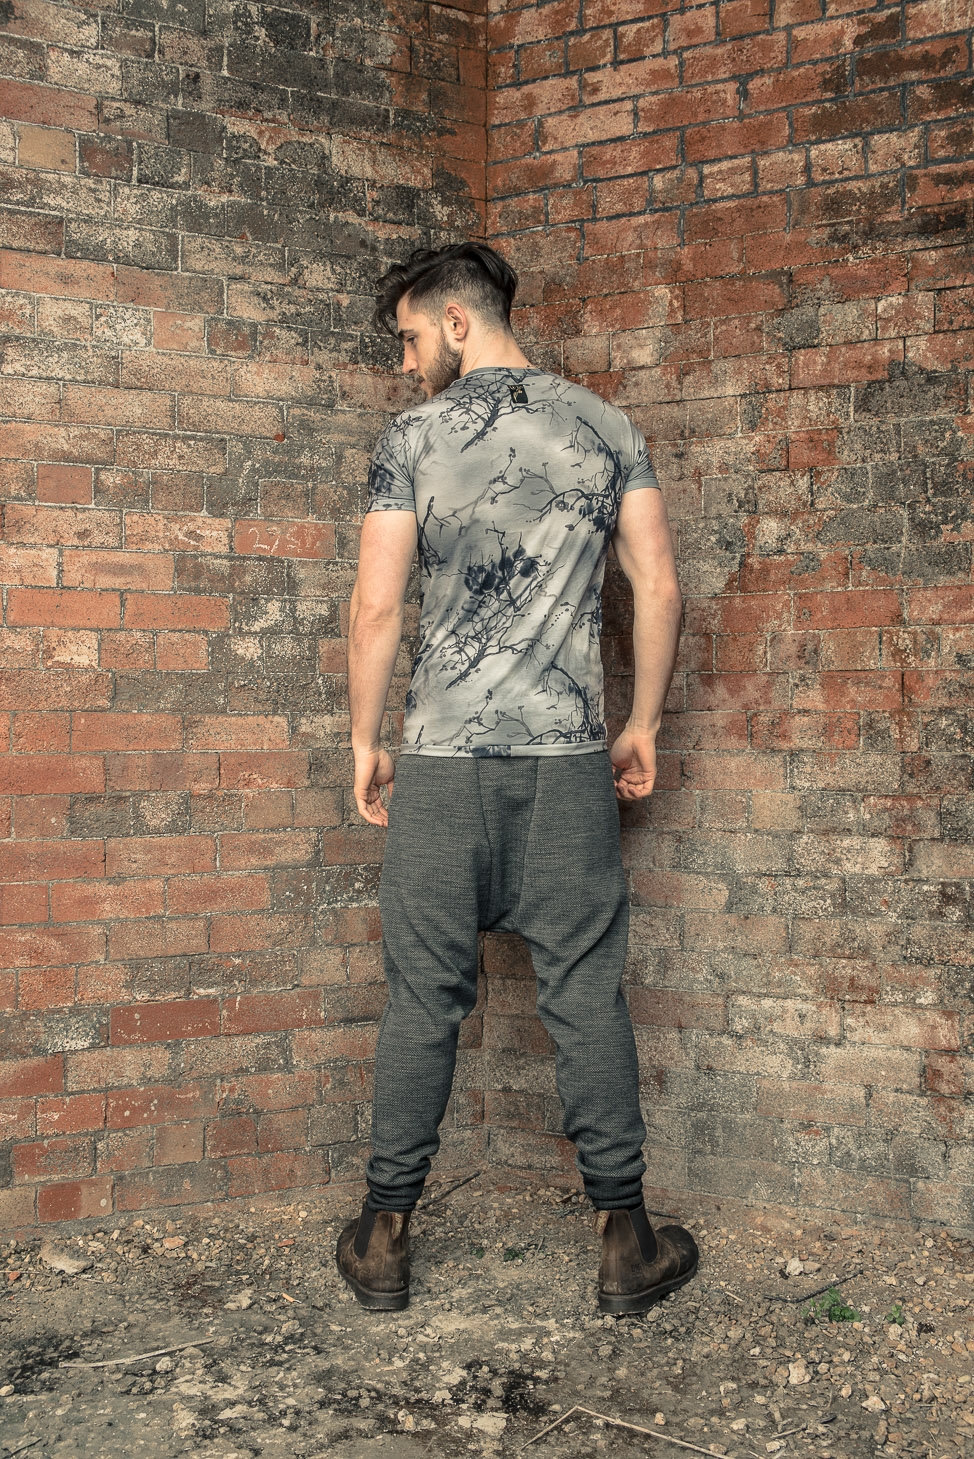 zaramia-ava-zaramiaava-leeds-fashion-designer-ethical-sustainable-tailored-minimalist-fitted-versatile-drape-koji-grey-tshirt-top-hareem-trousers-black-grey-texture-styling-menswear-model-22